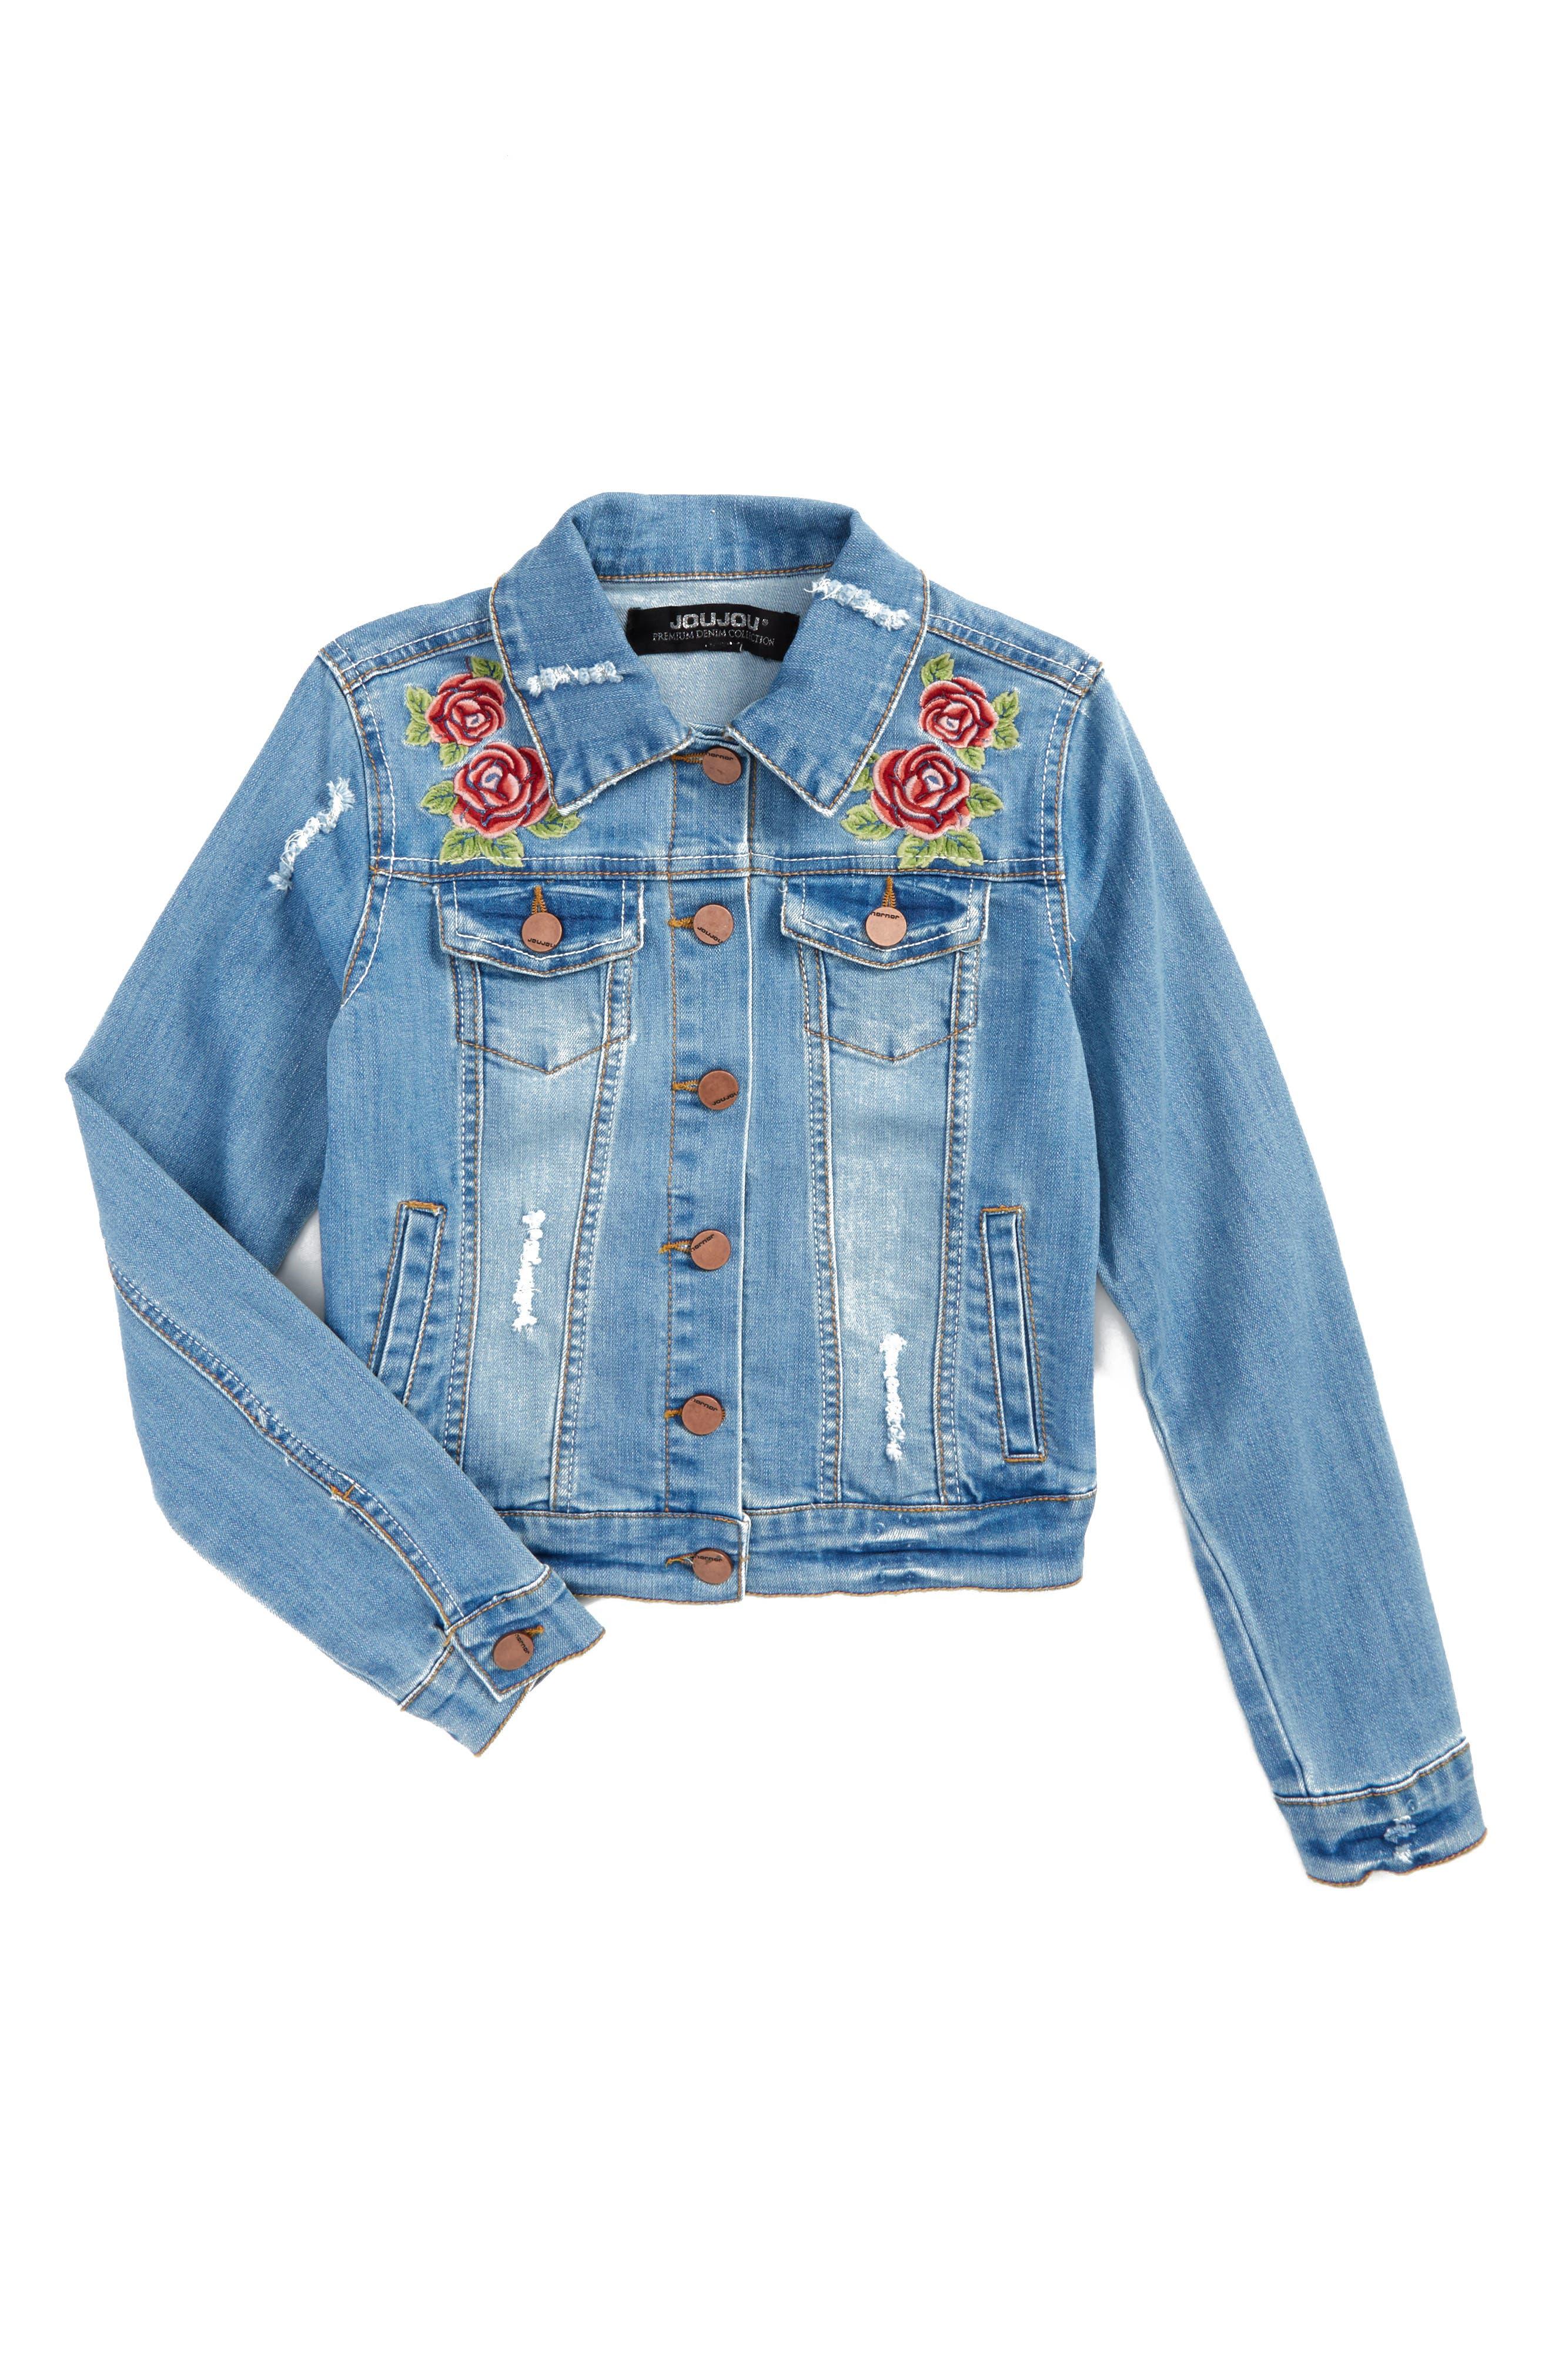 Main Image - Jou Jou Embroidered Denim Jacket (Big Girls)